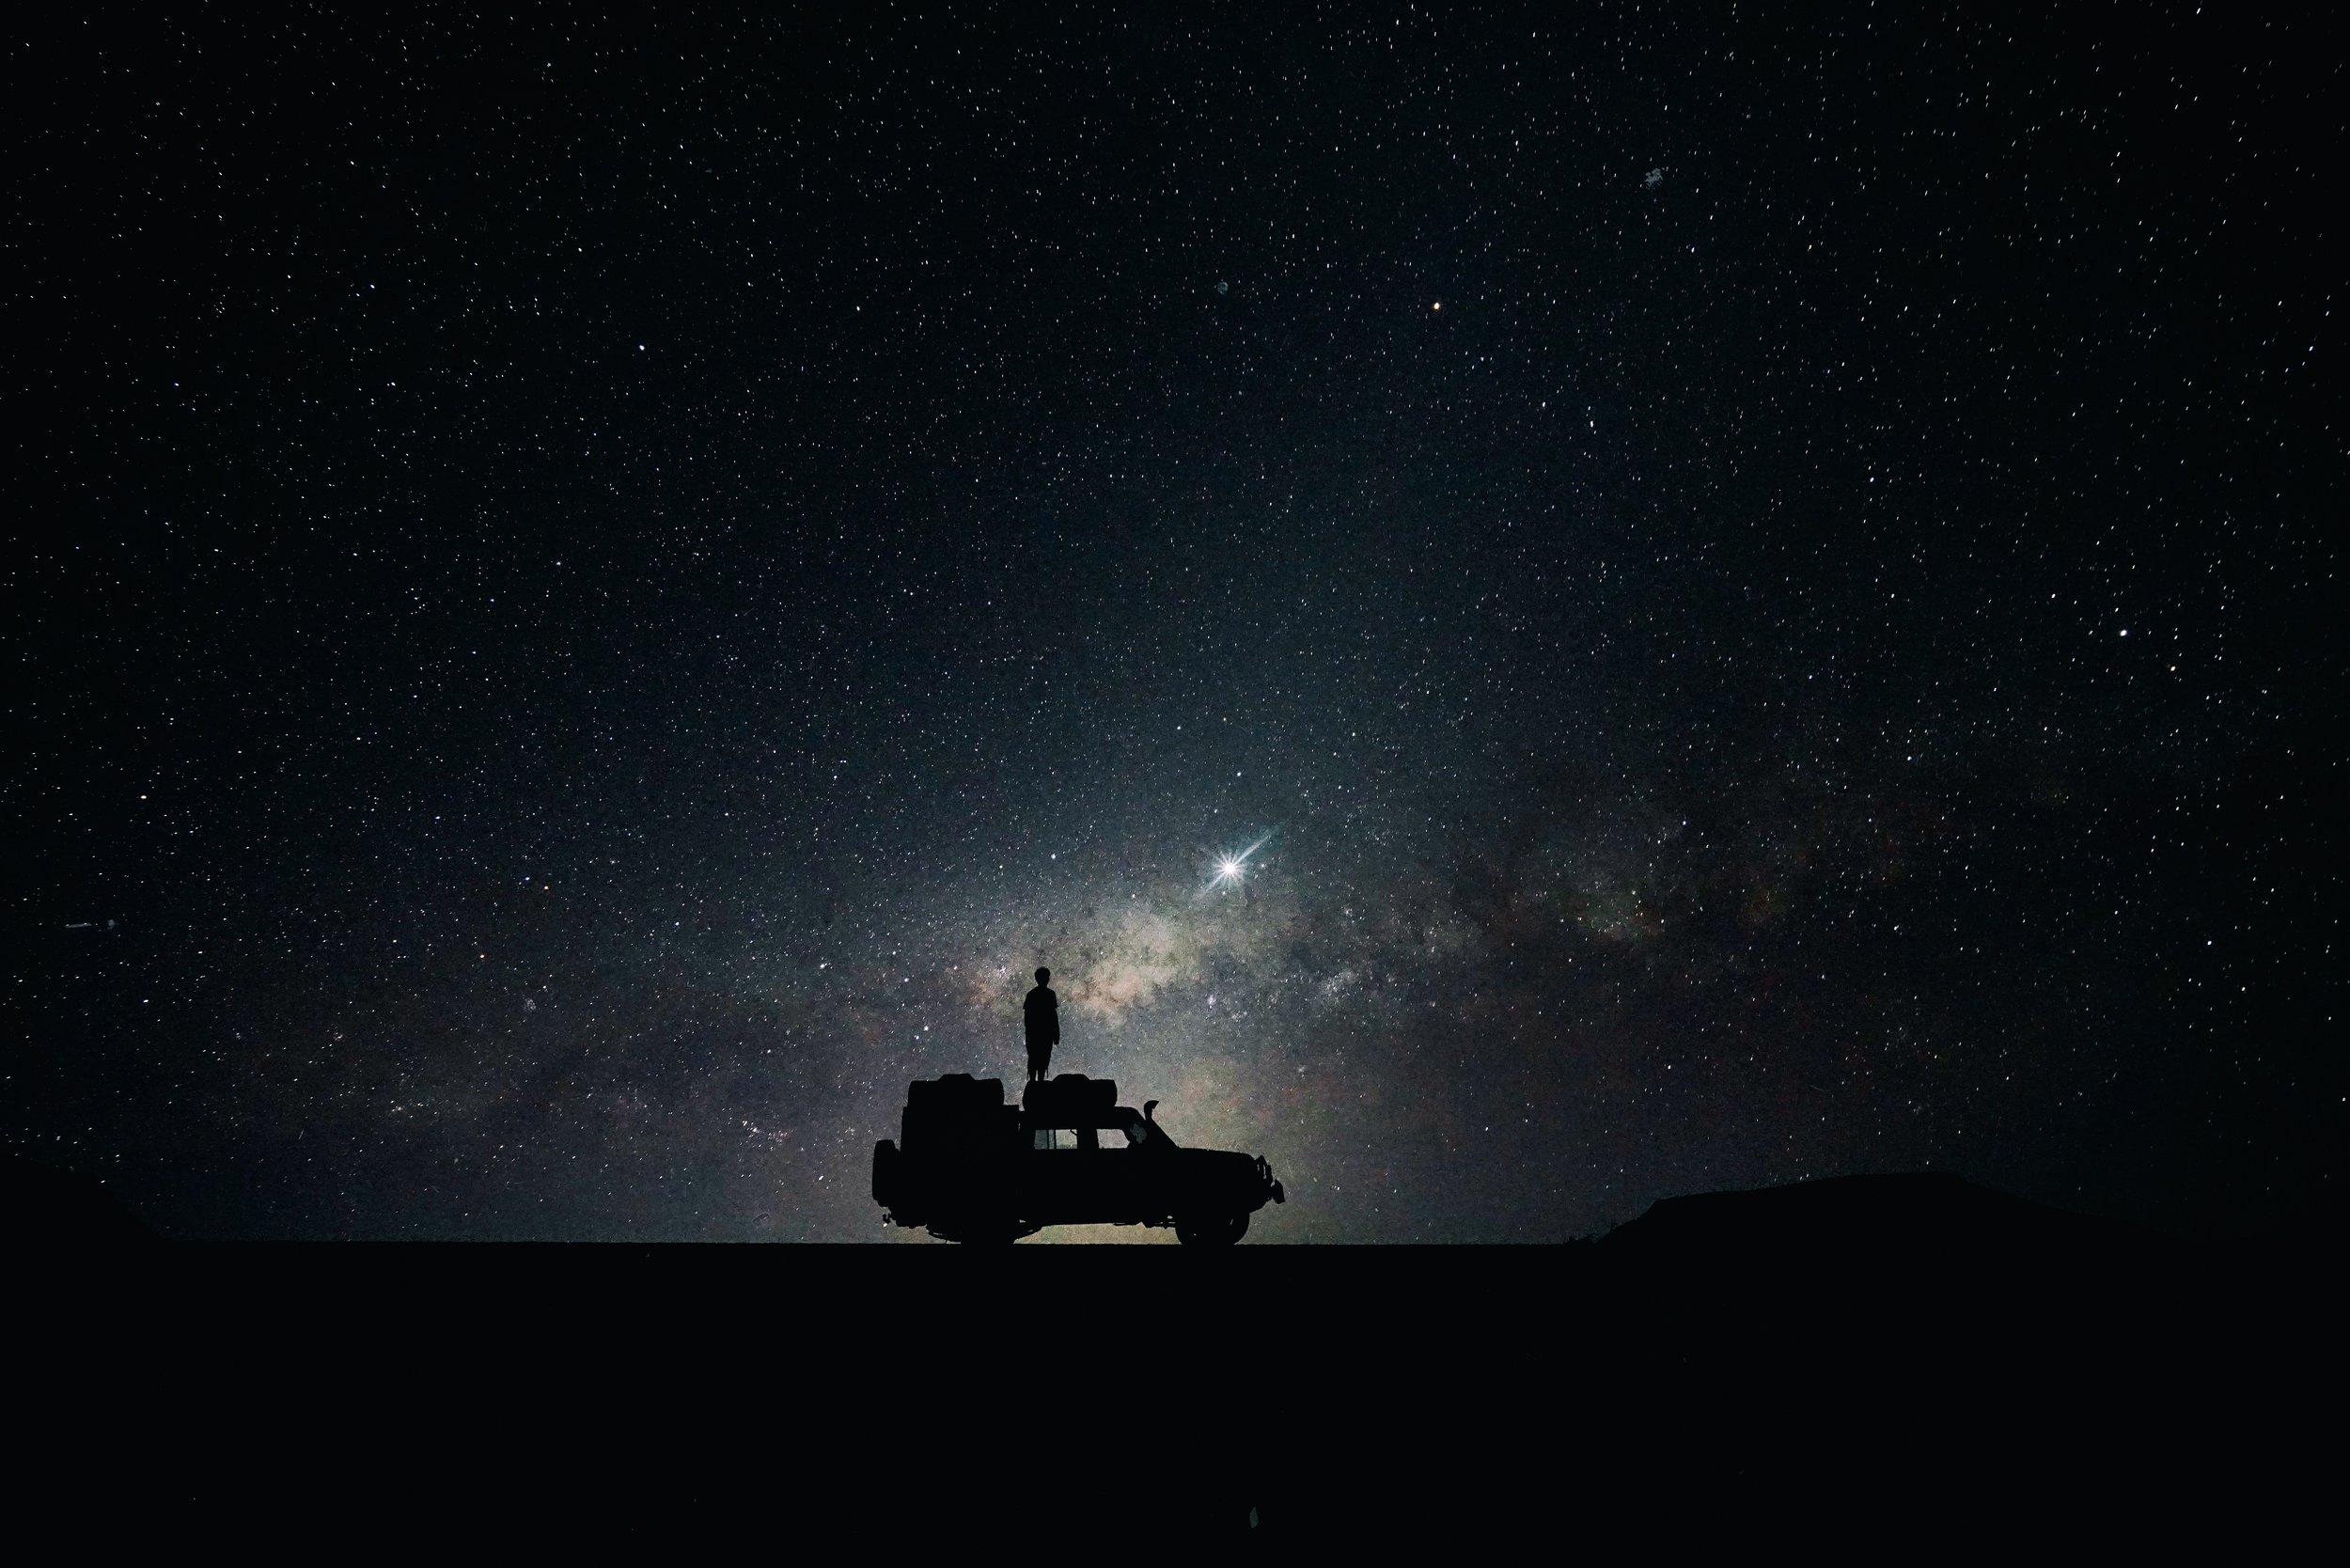 namibia noche.jpg